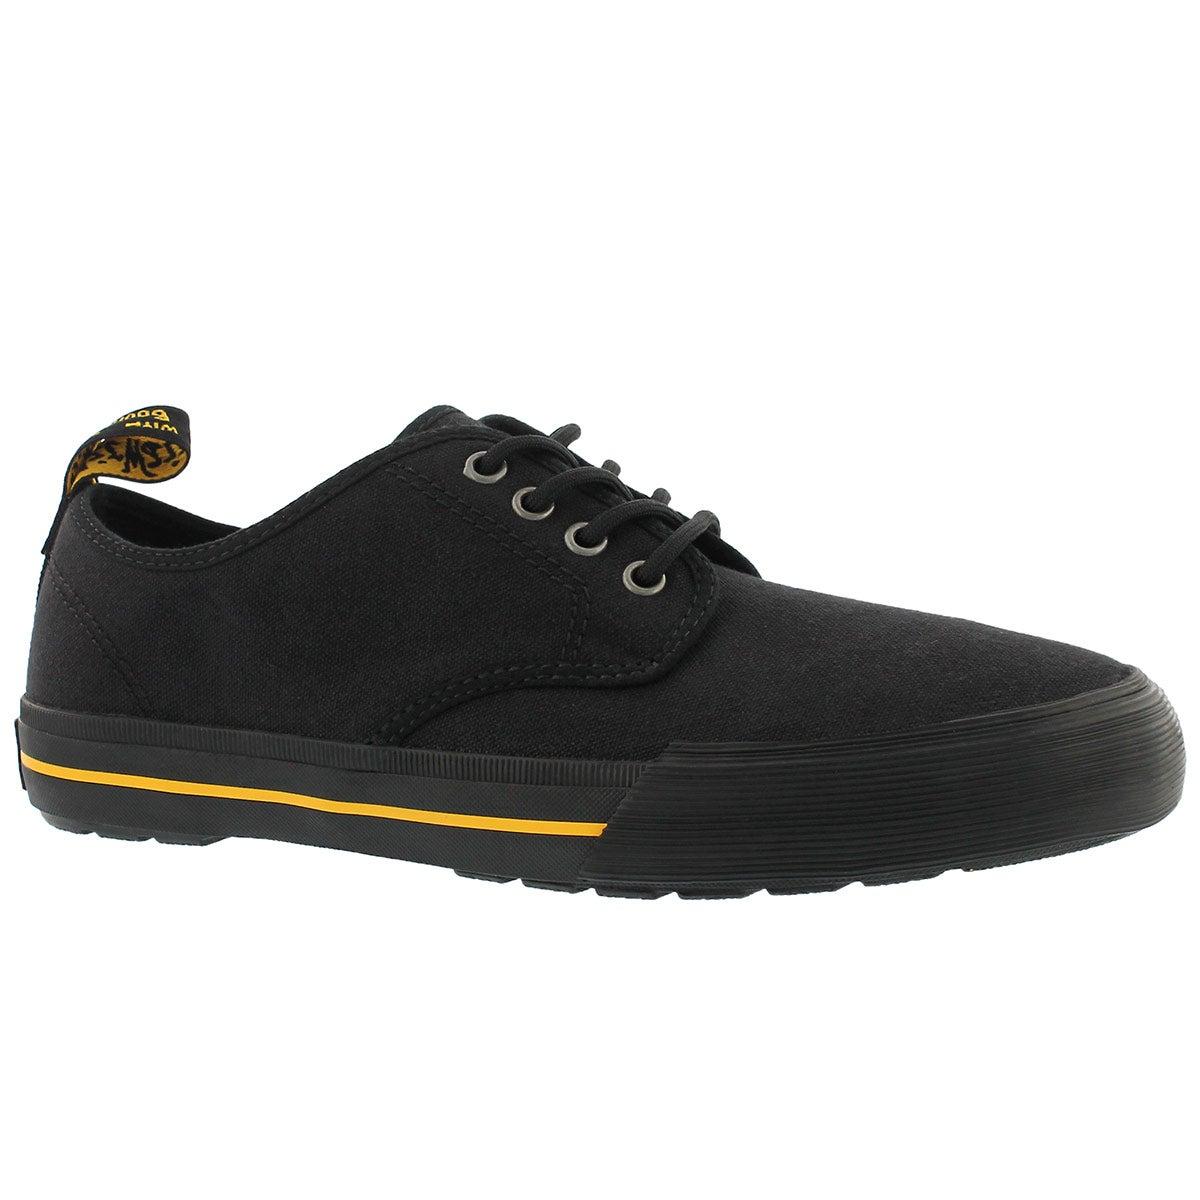 Men's PRESSLER black lace up sneakers